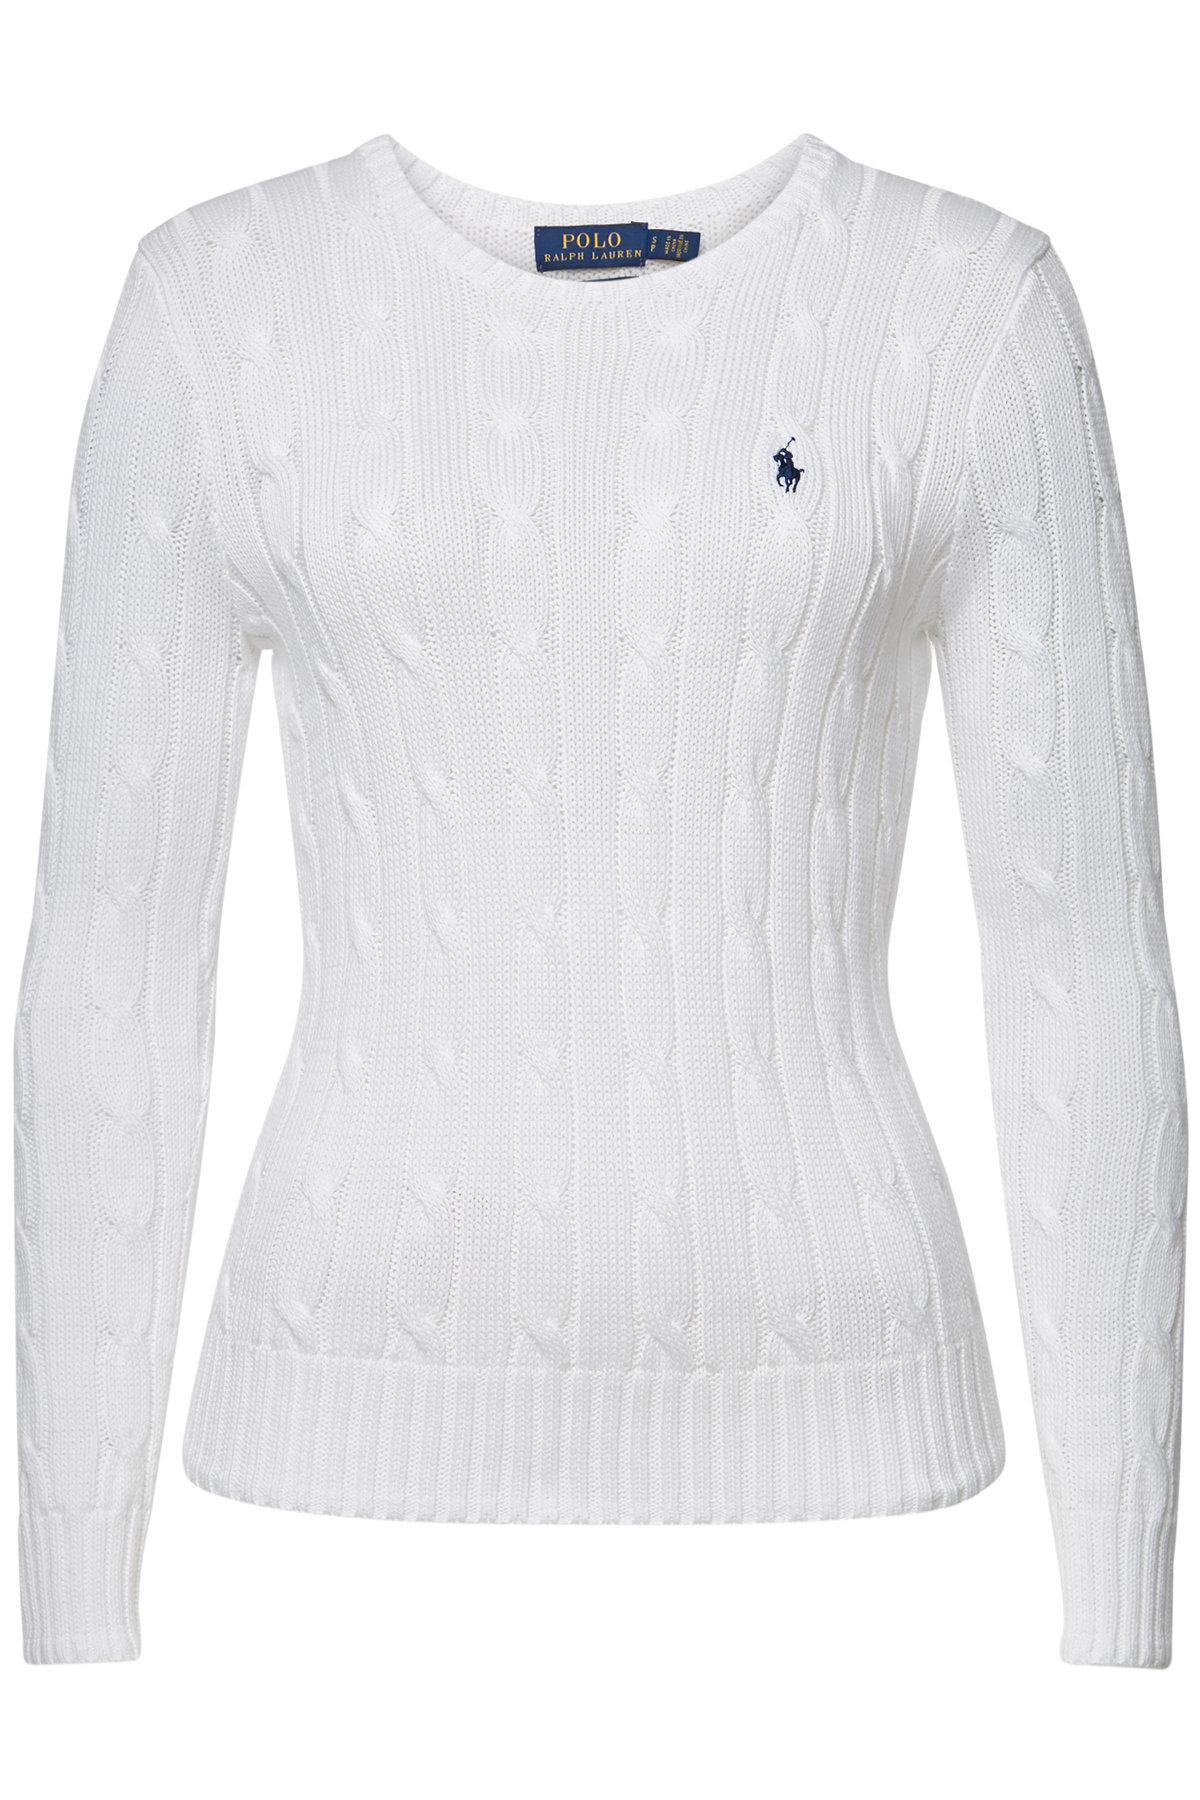 3b11f0962da021 Polo Ralph Lauren Julianna Cotton Pullover in White - Lyst